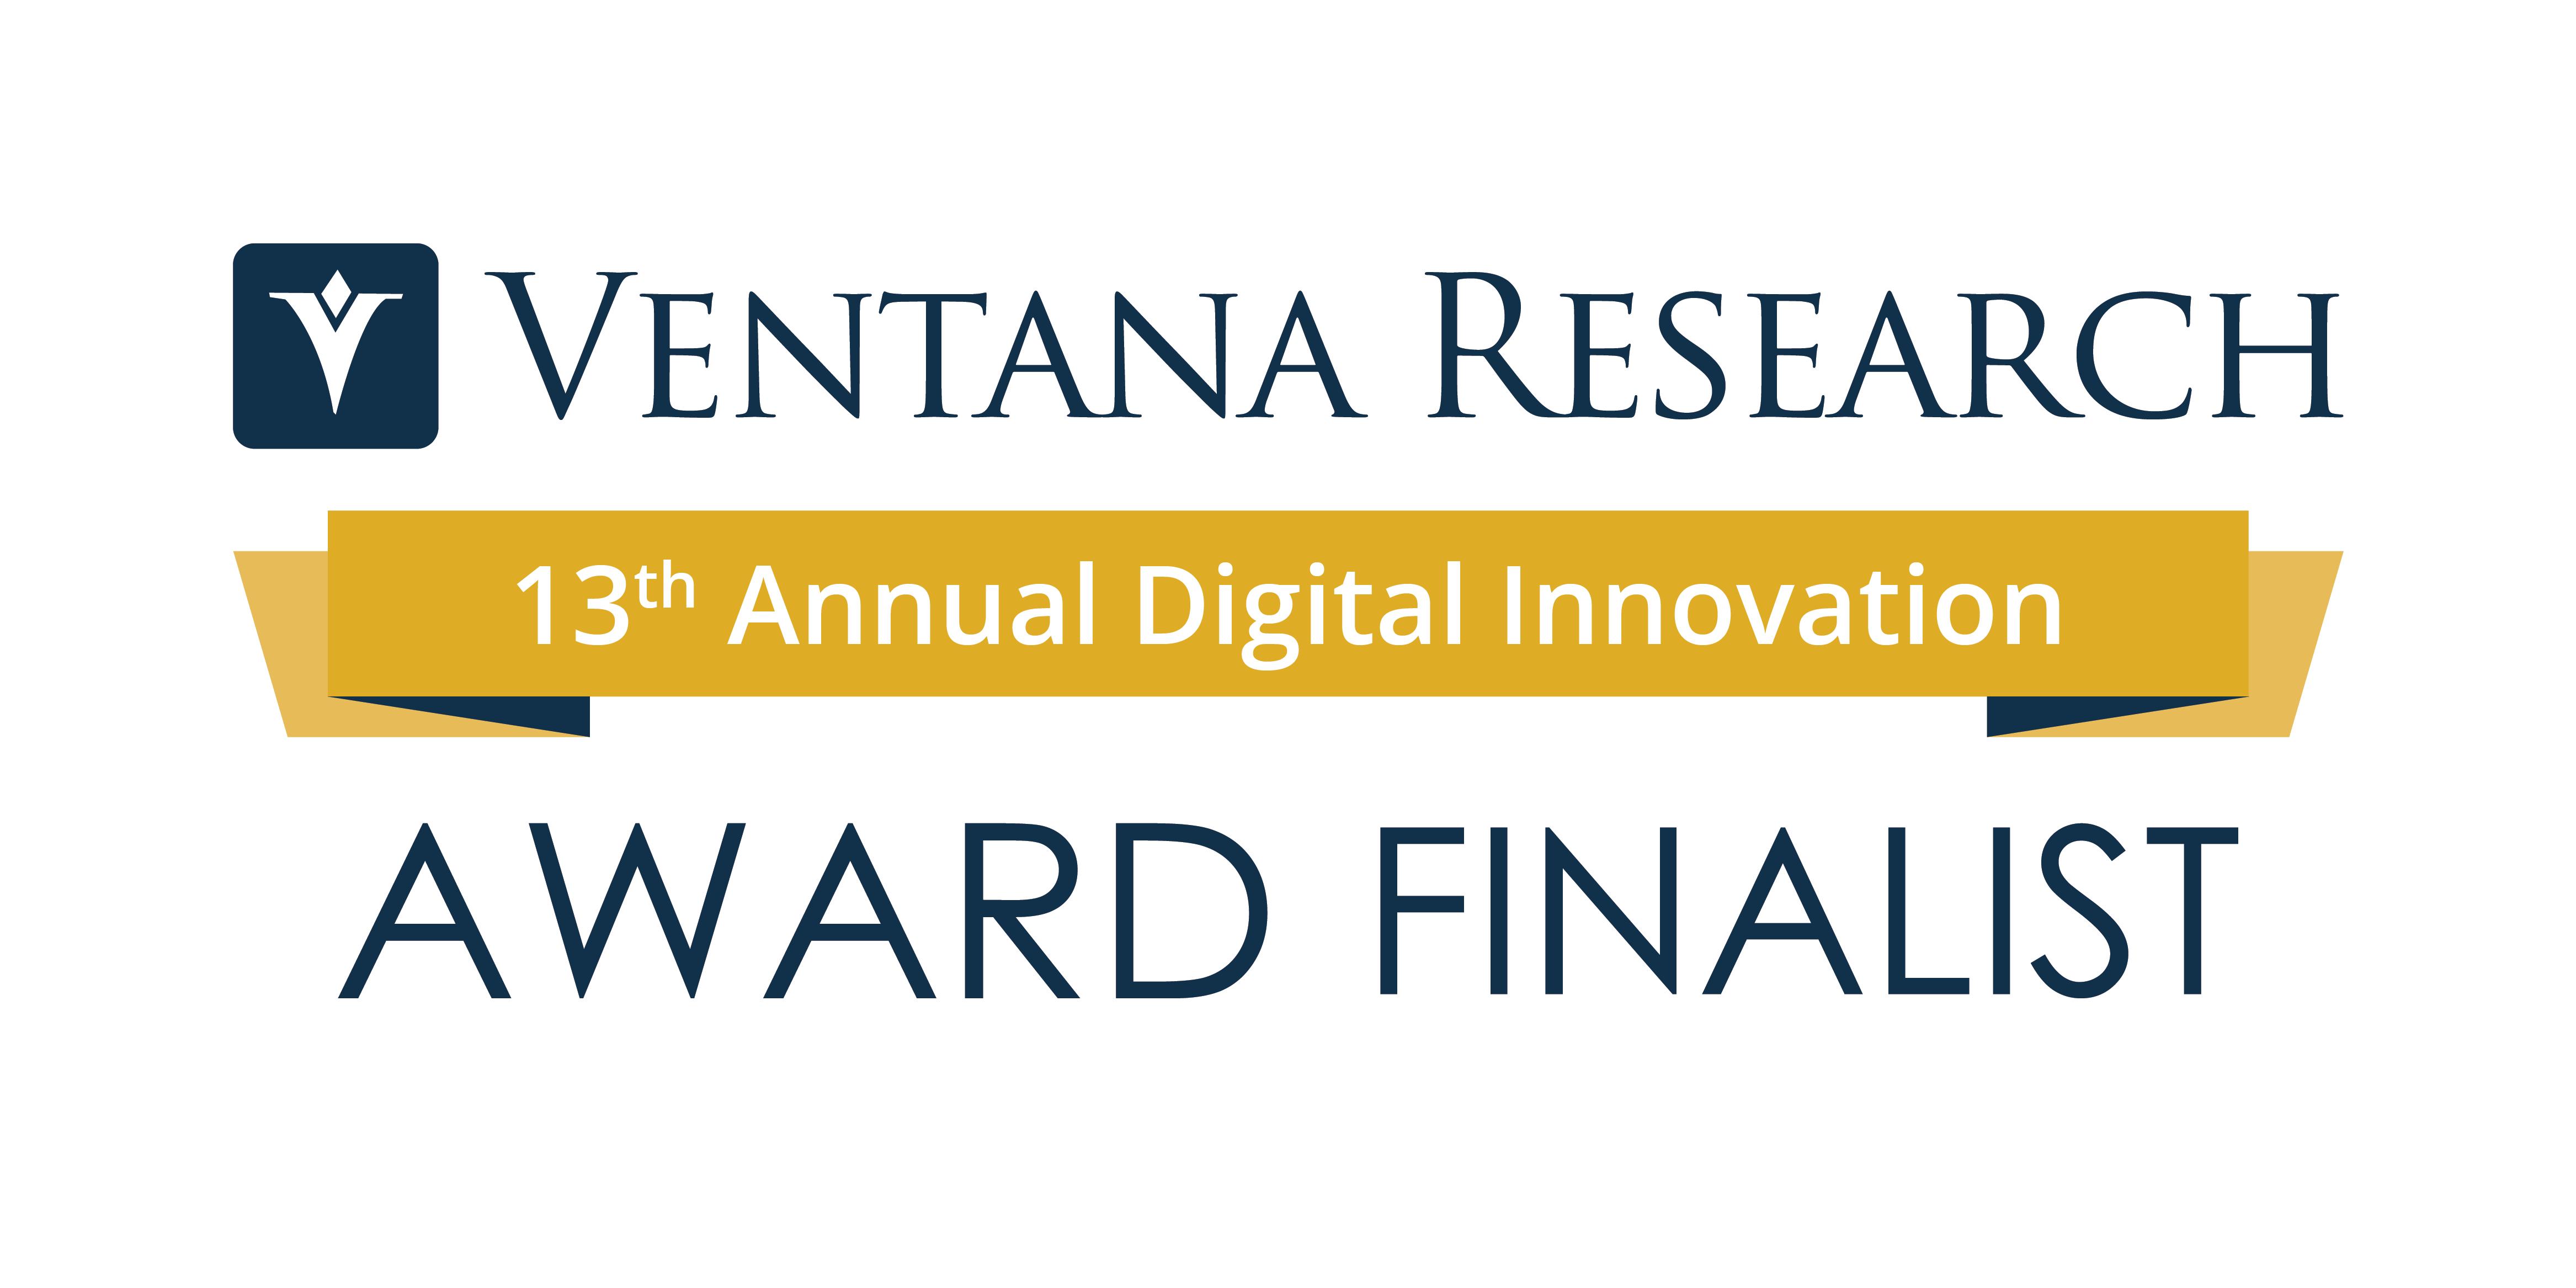 Ventana_Research_13th_Digital_Innovation_Awards_Finalist-1